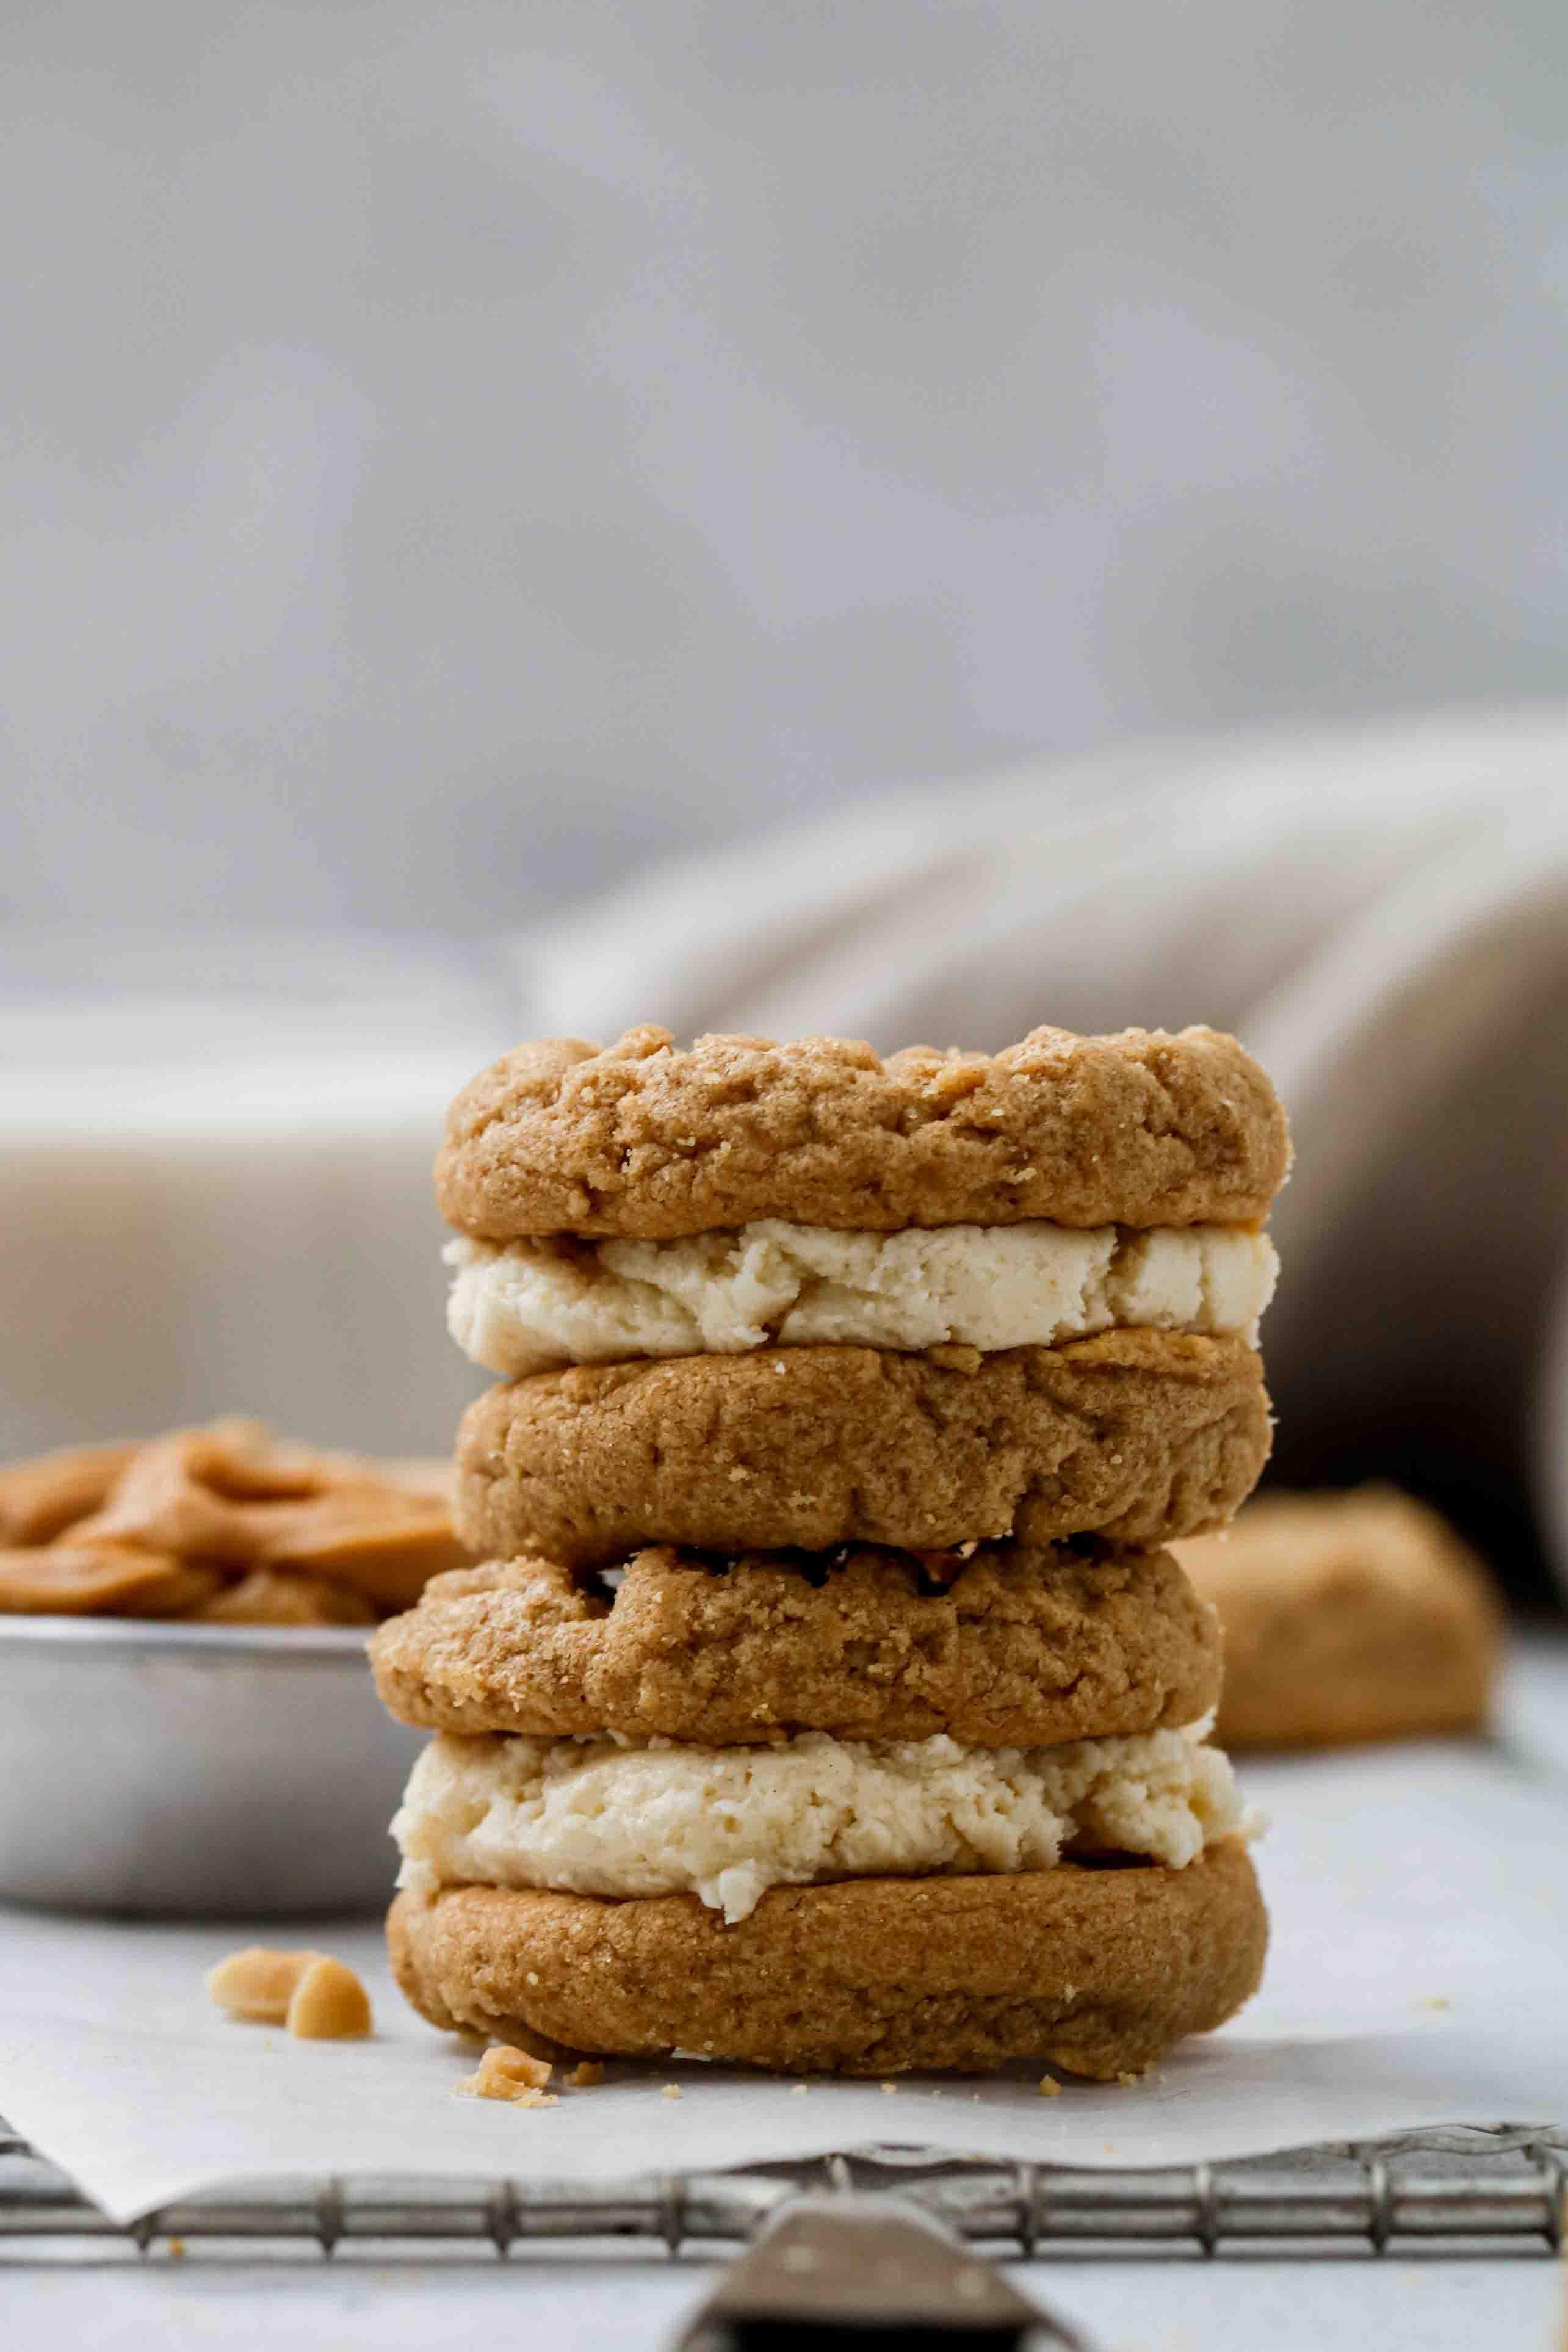 Stuffed peanut butter cookie